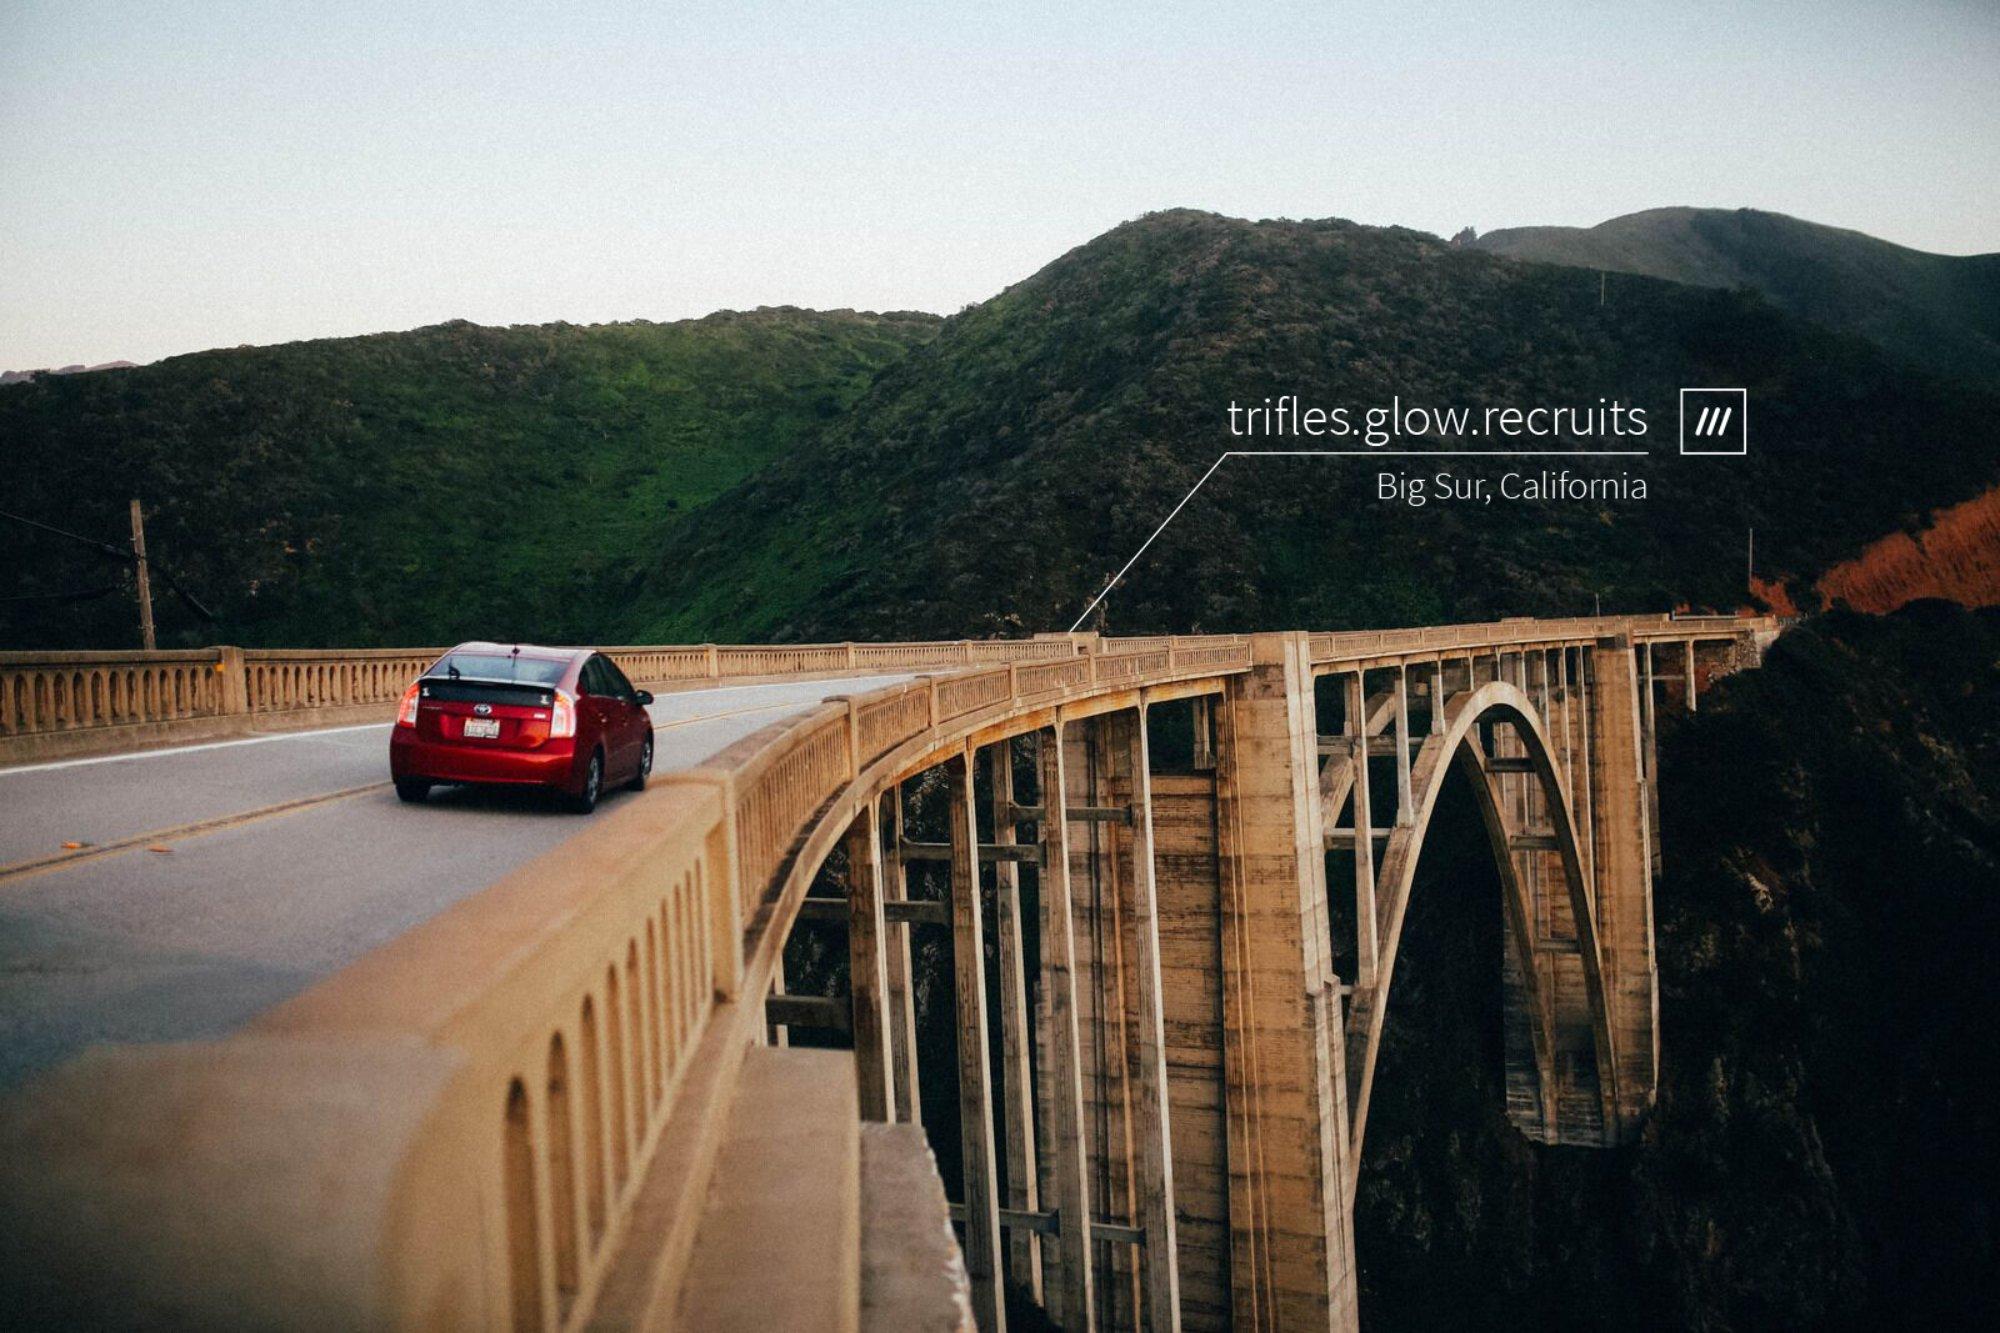 car driving along bridge towards 3 word address trifles.glow.recruits